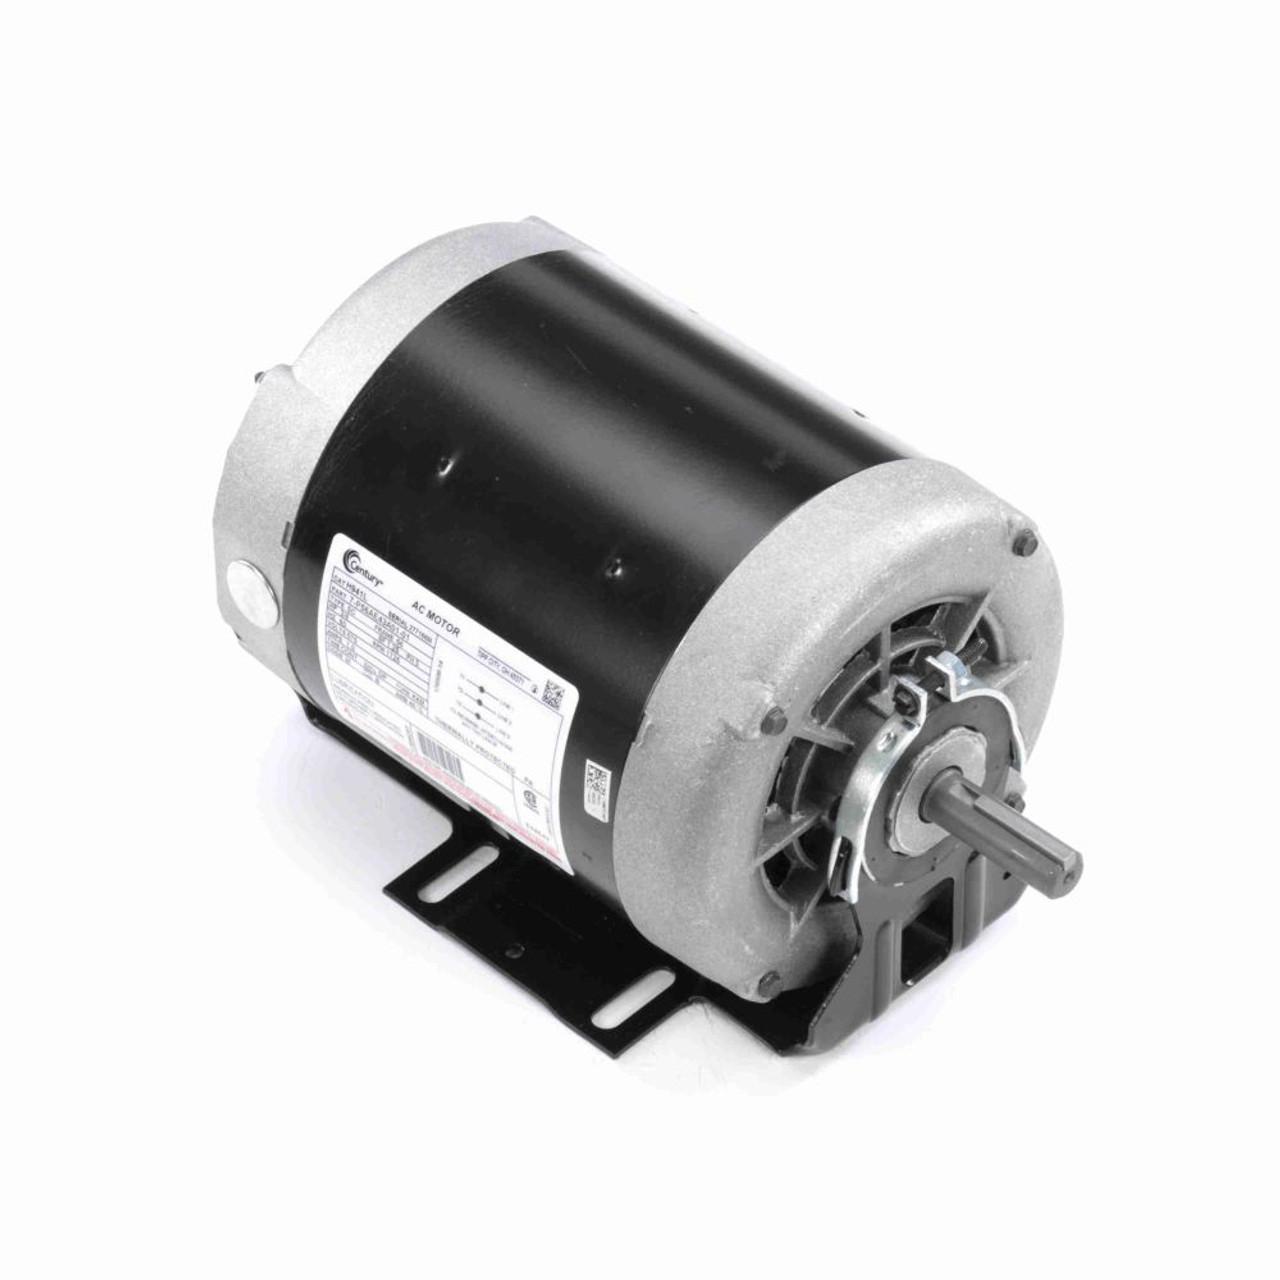 medium resolution of century 4 in 1 motor capacitor wiring